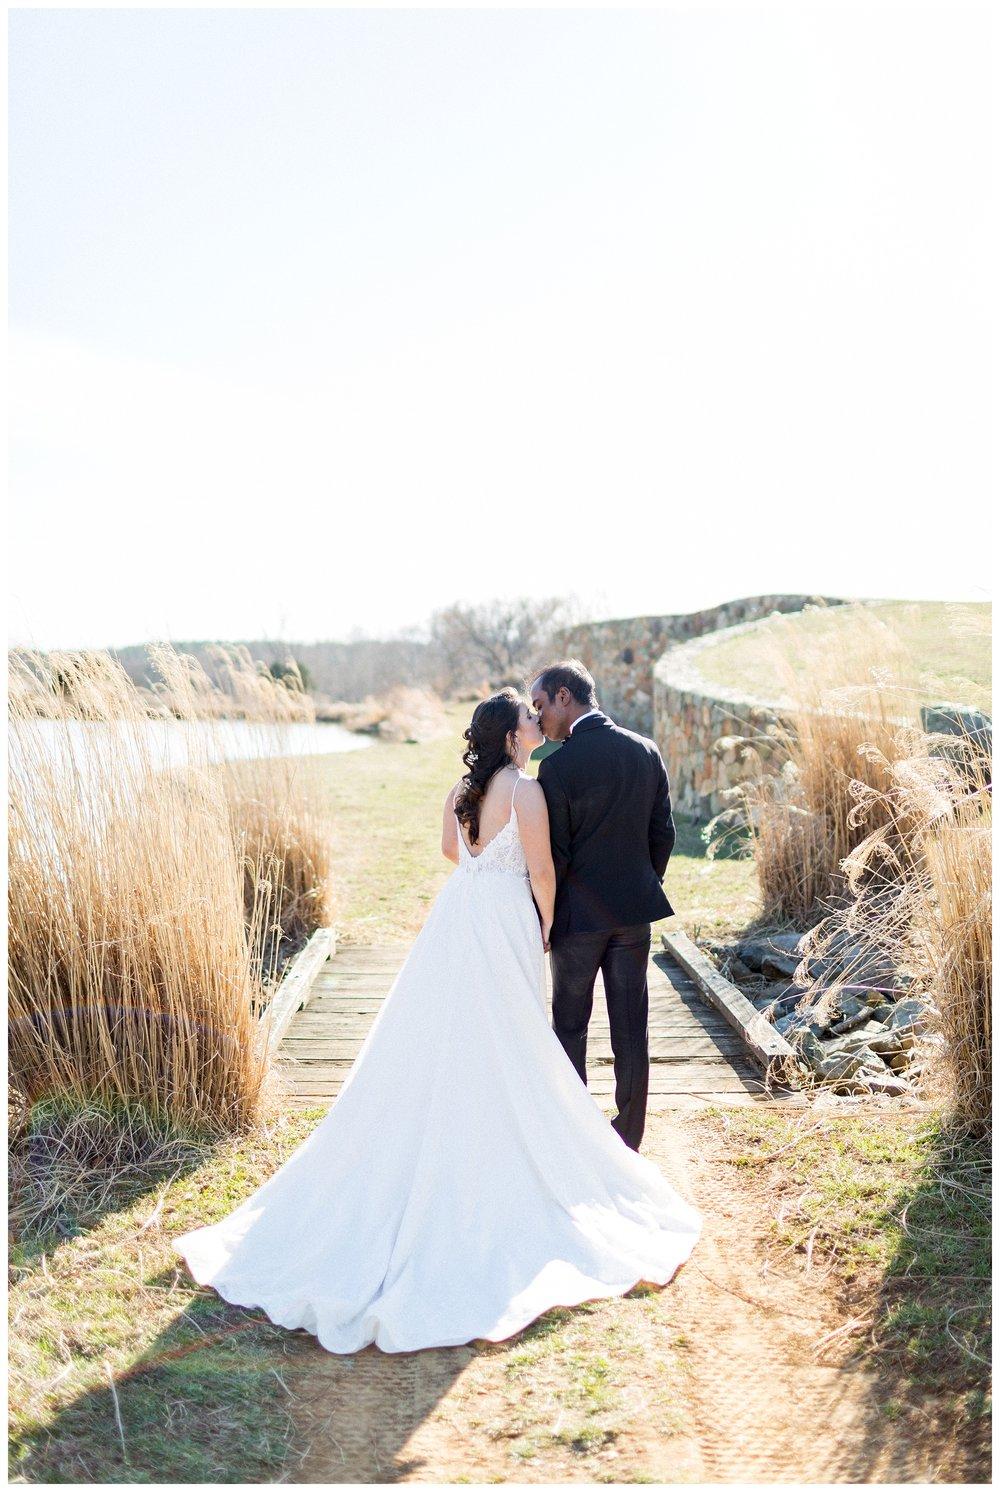 Stone Tower Winery Wedding | Virginia Winter Wedding | VA Wedding Photographer Kir Tuben_0058.jpg